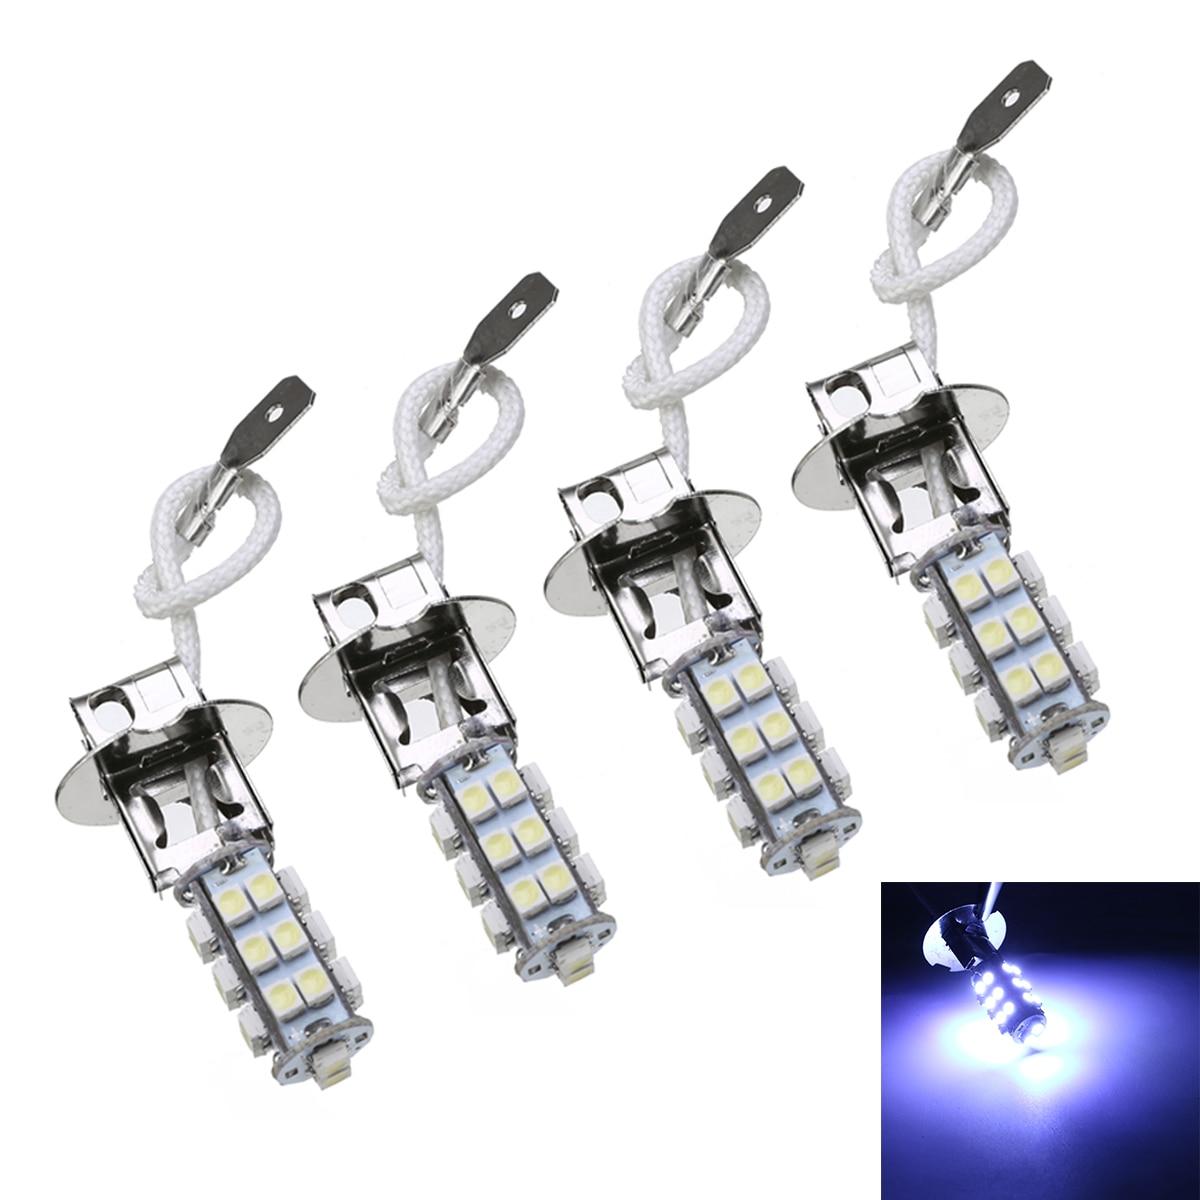 New Arrival 4pcs/set H3 2835 LED Car Fog Driving Light Lamp Bulb 6000K White 12V Interior Source